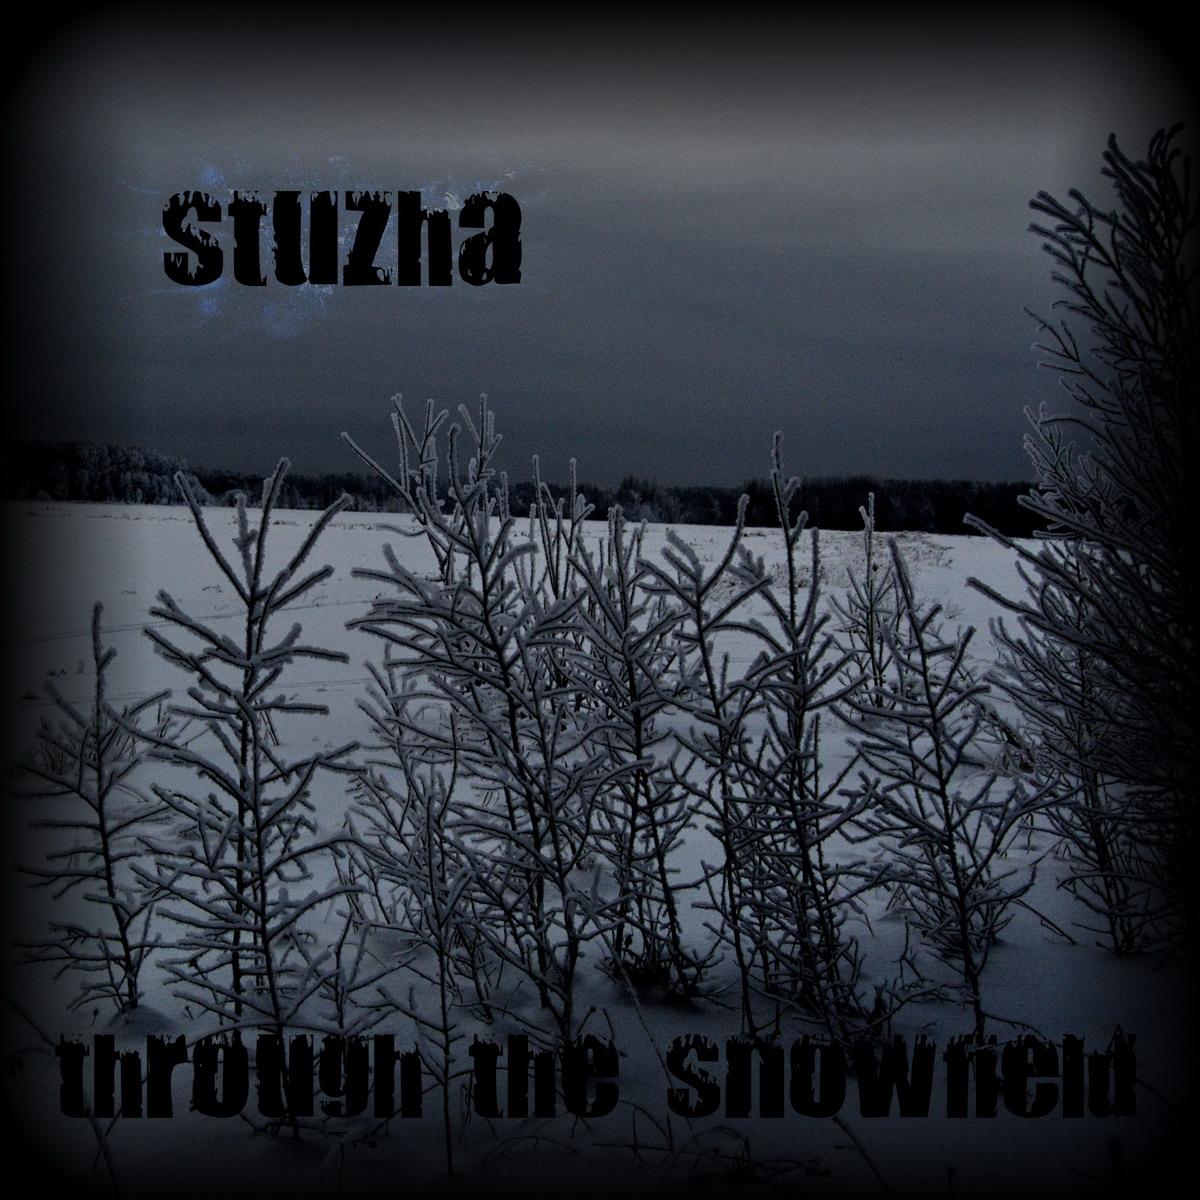 stuzha_01.jpg